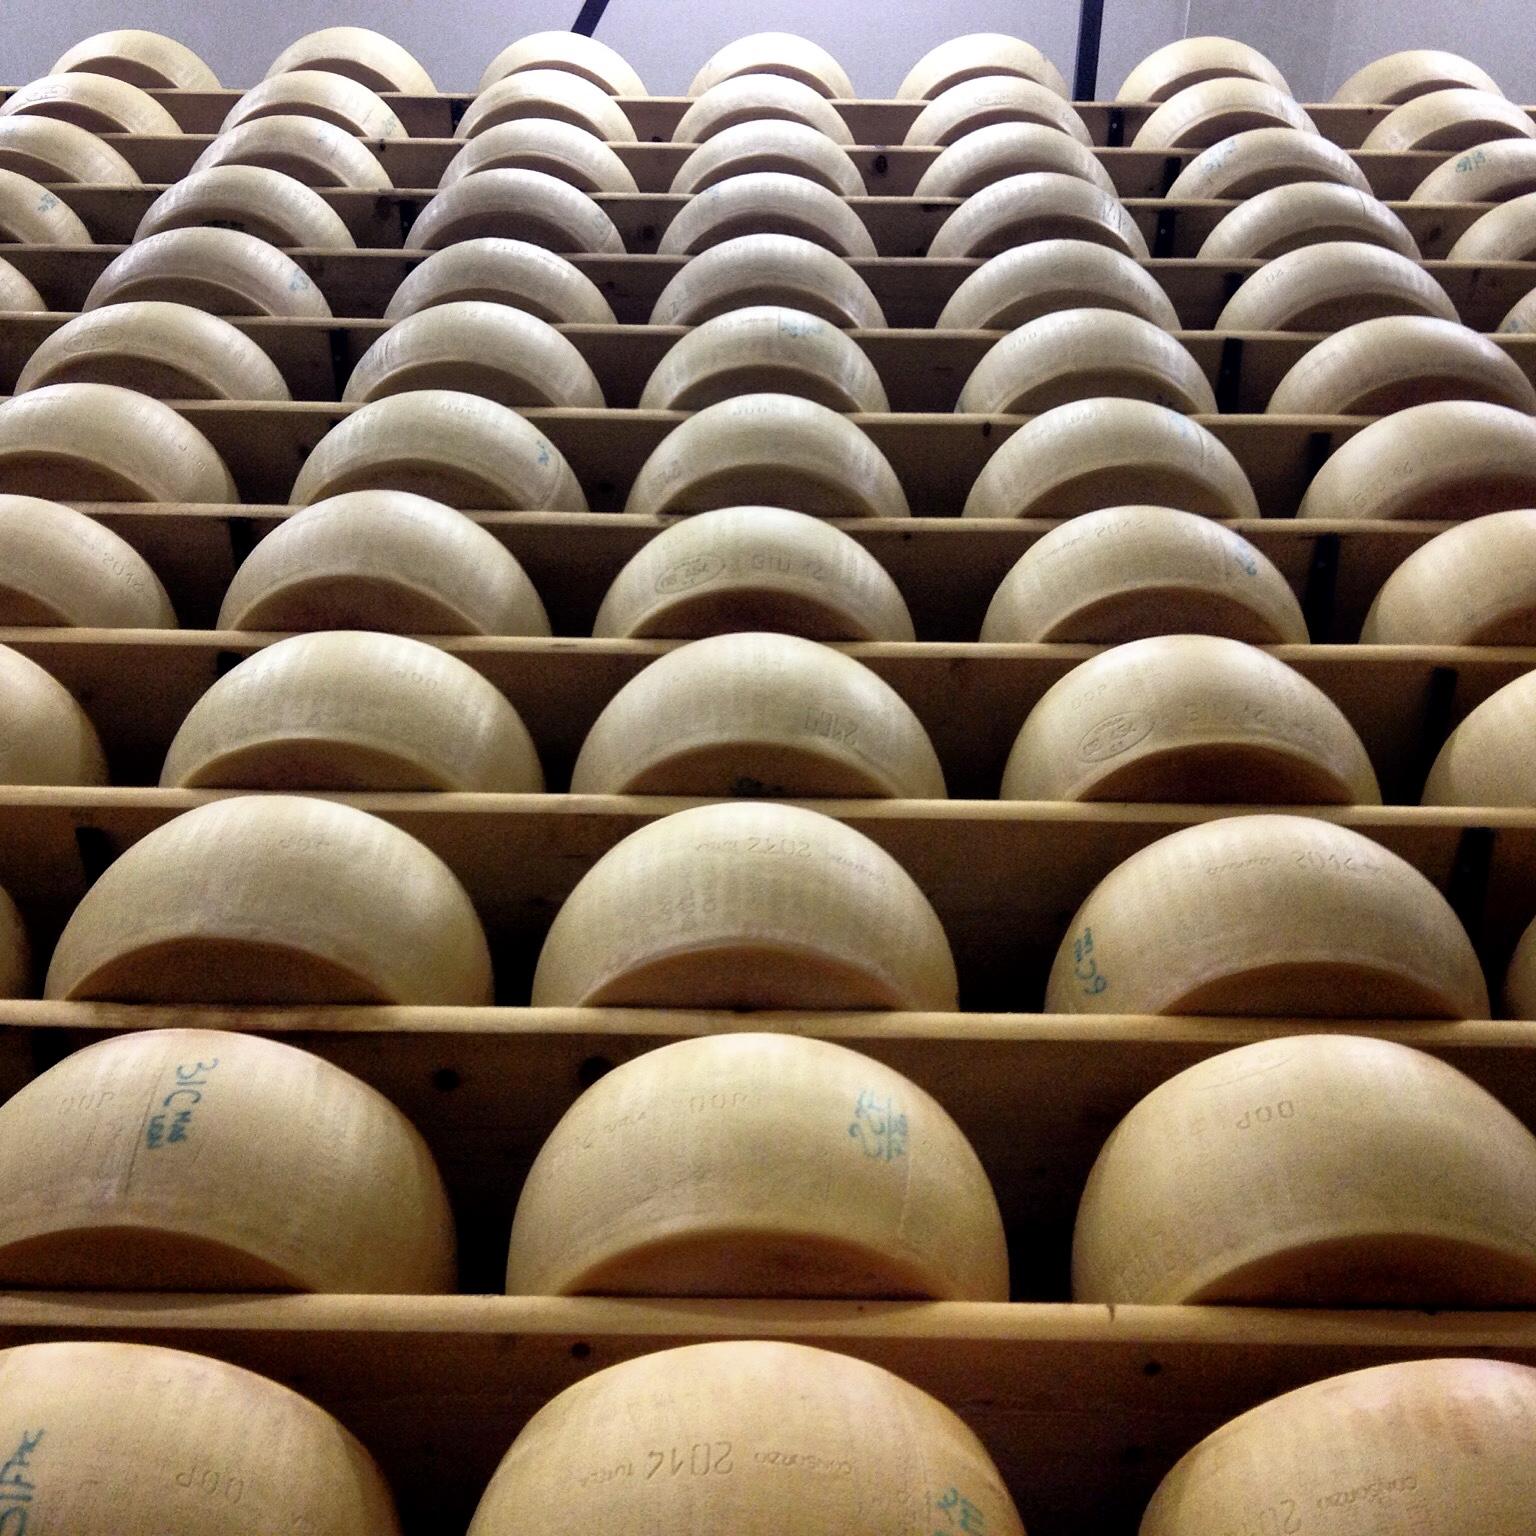 Parmigiano di Reggiano